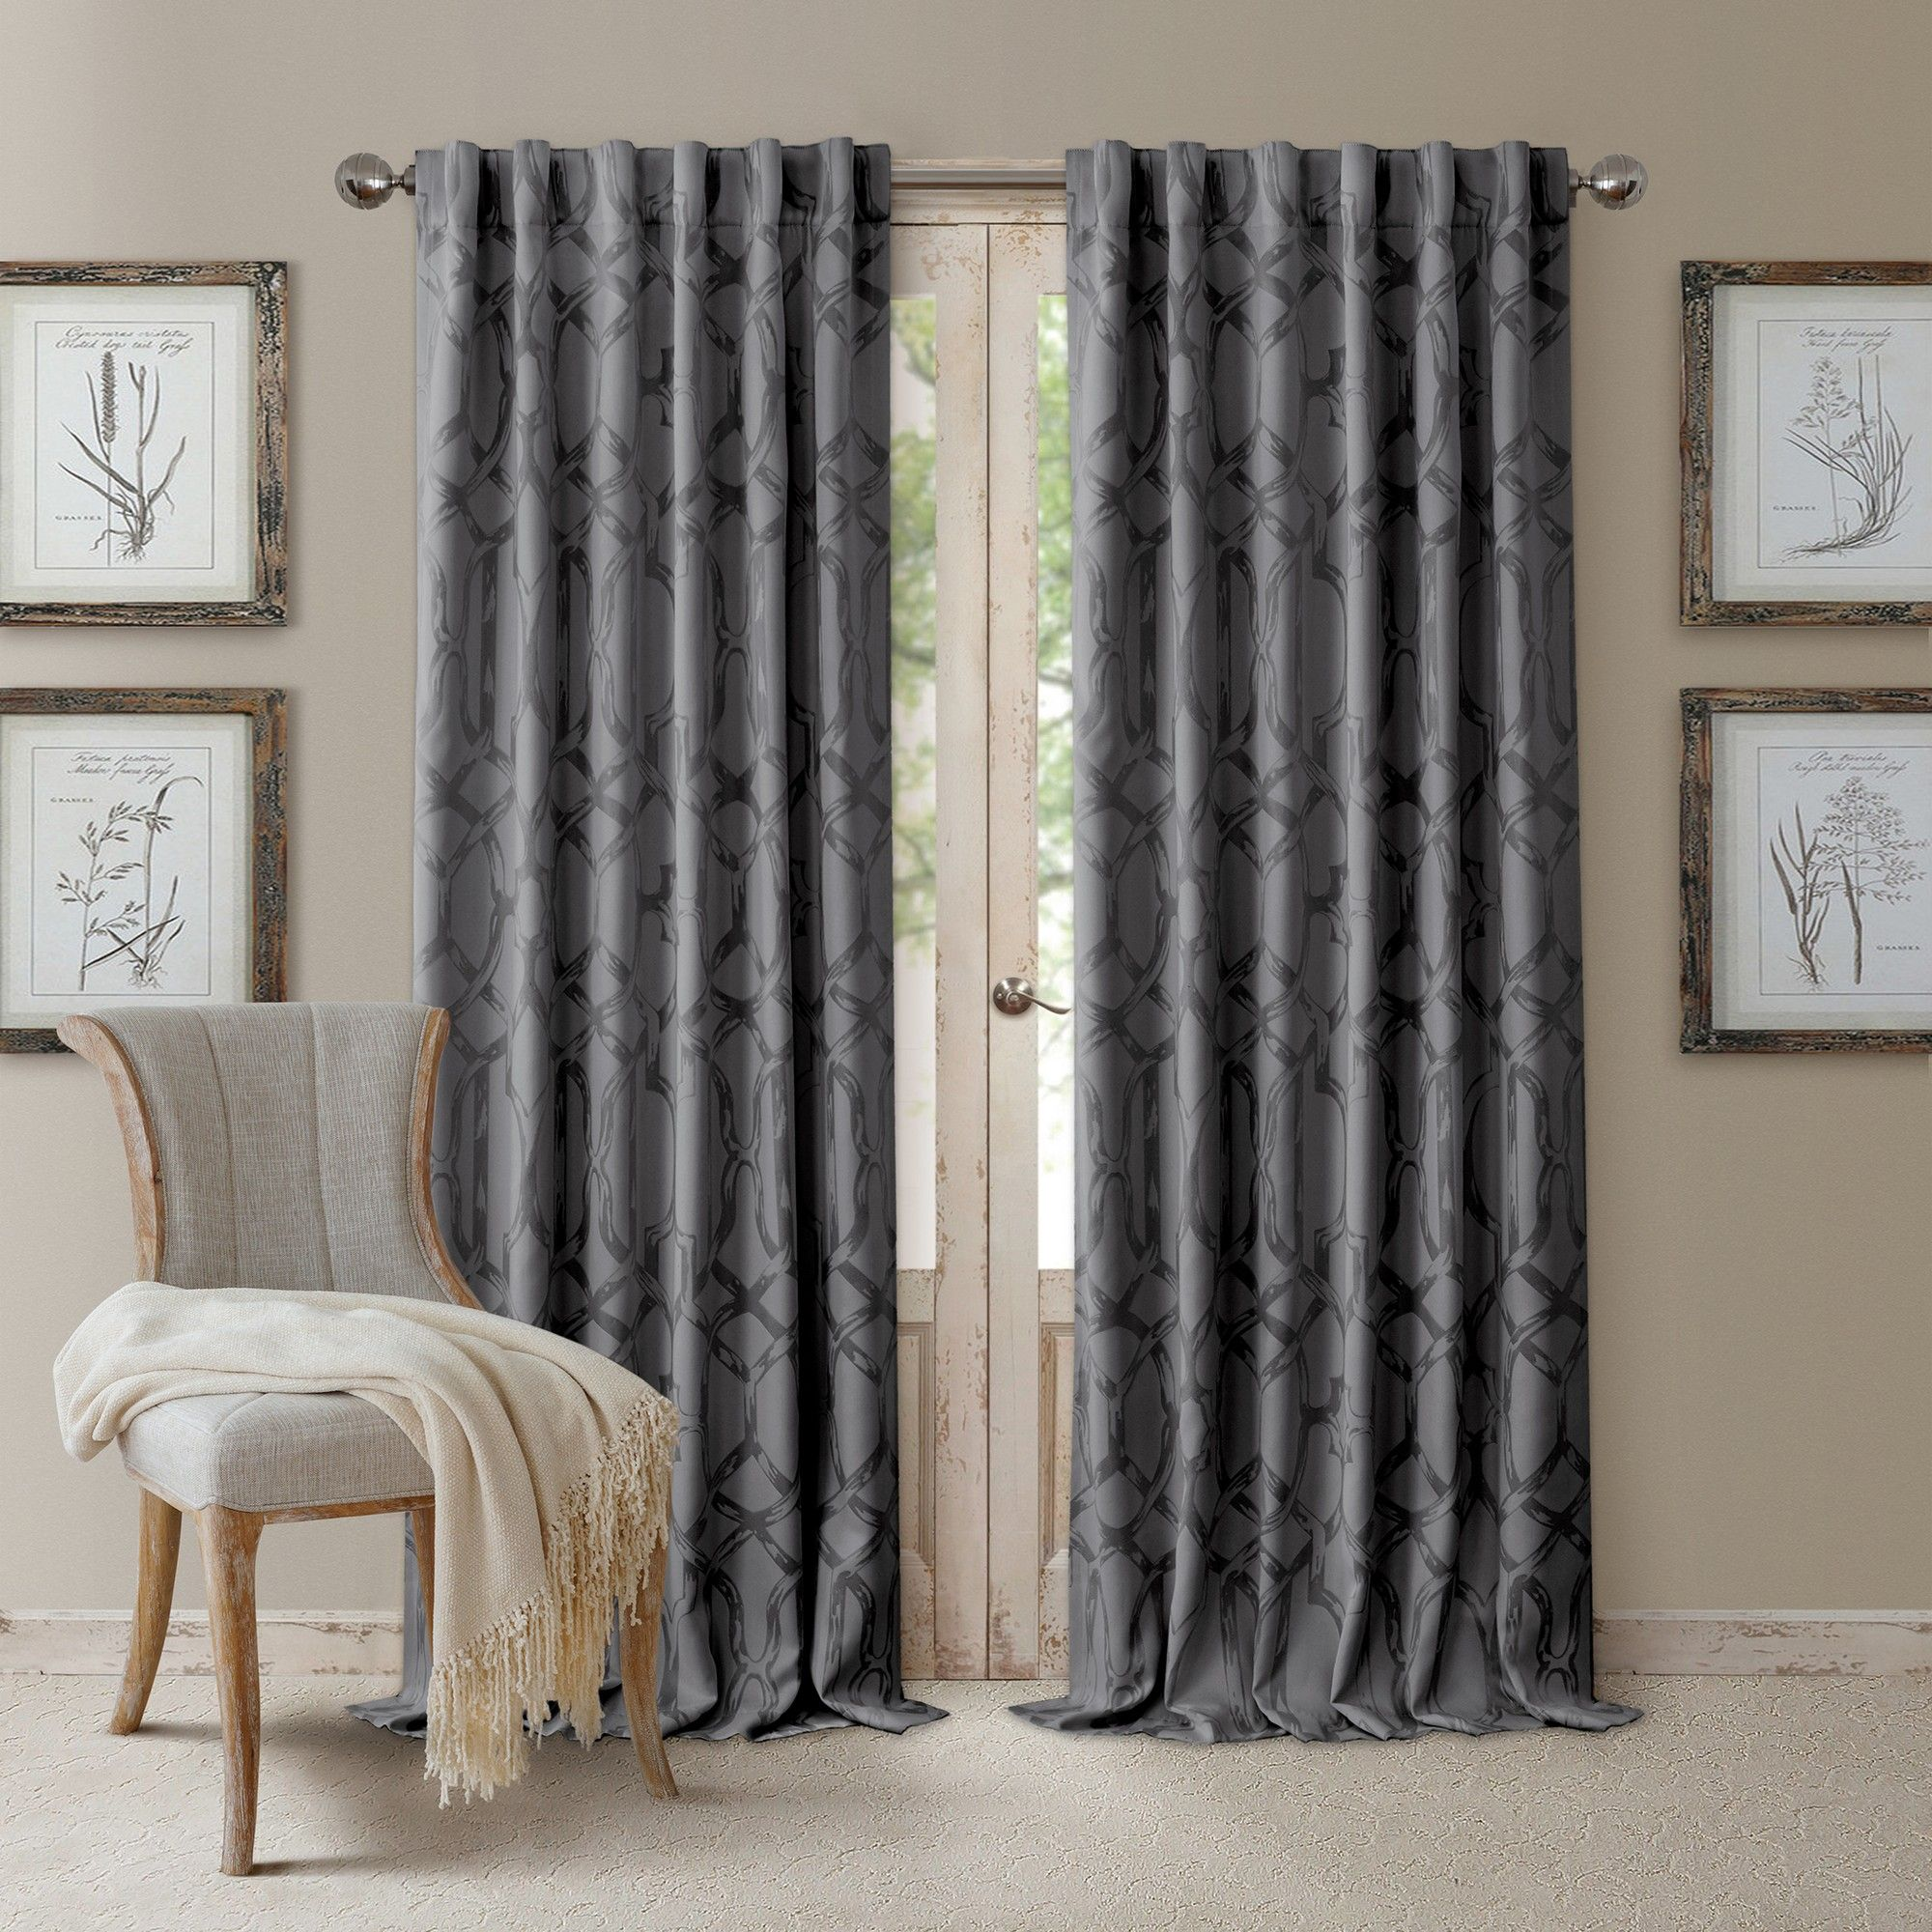 Darla Tonal Blackout Window Curtain Panel 52 X 108 Dark Gray